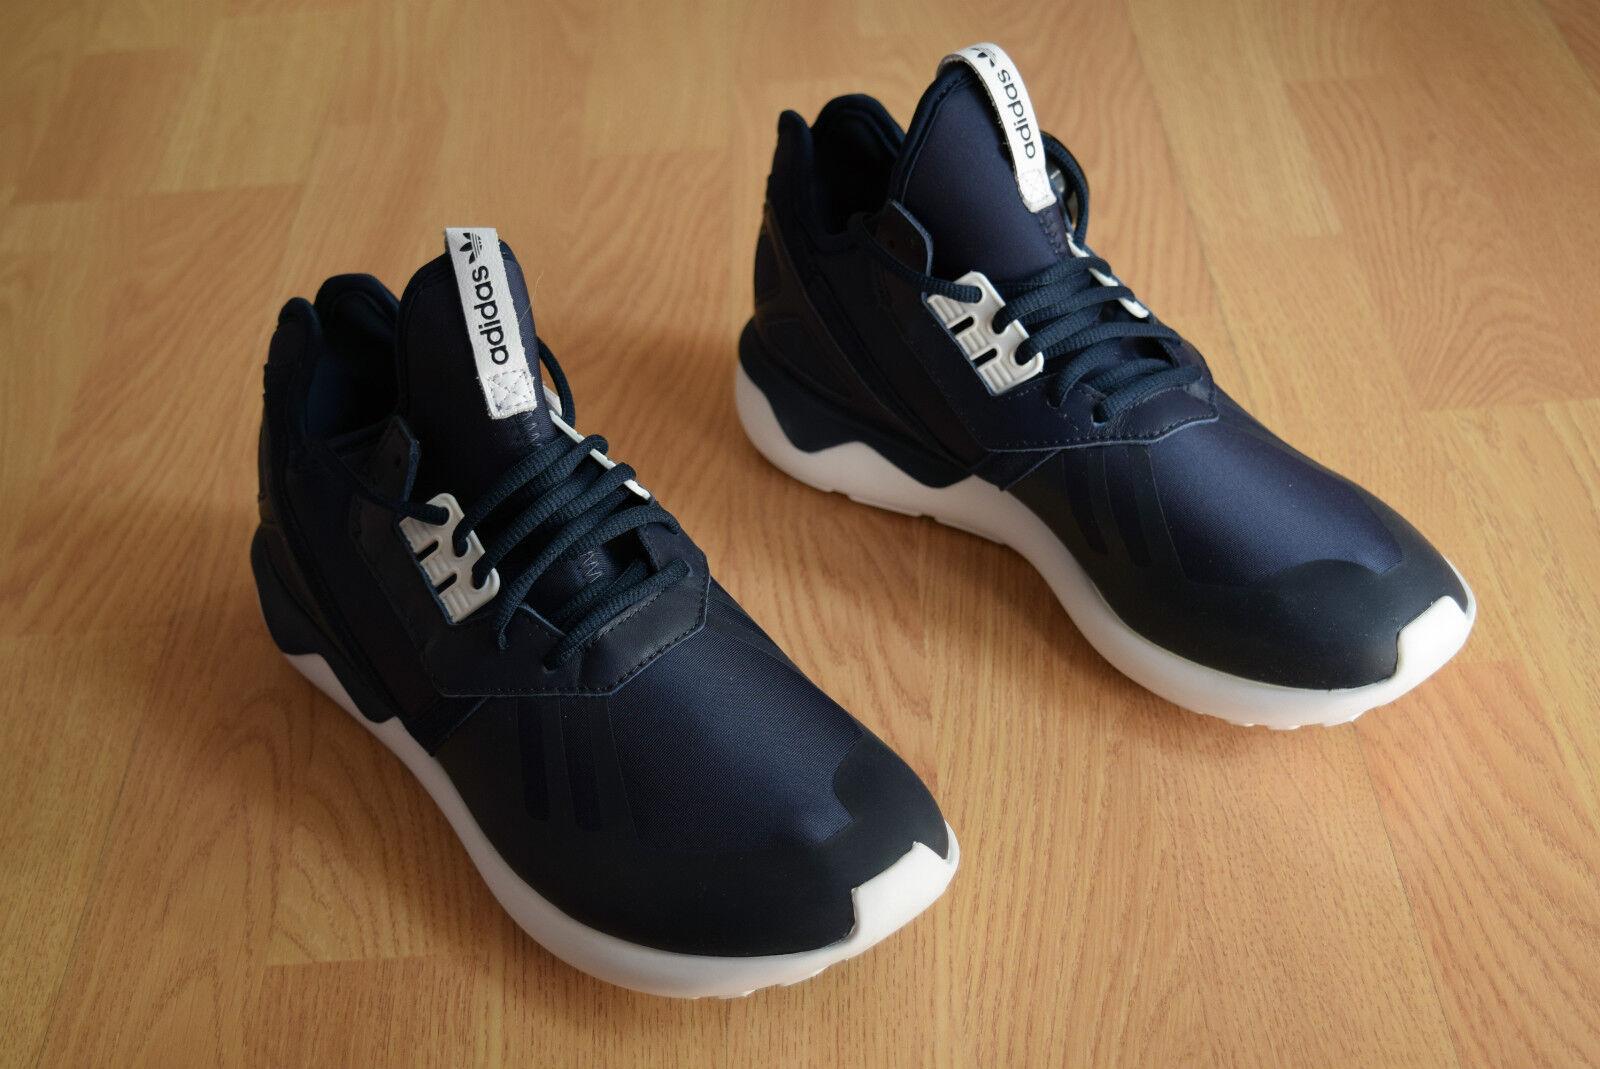 Adidas Tubular Runner 41 42 Support 44  B41273 cOnSorTium Support 42 yeezy fluX 175125